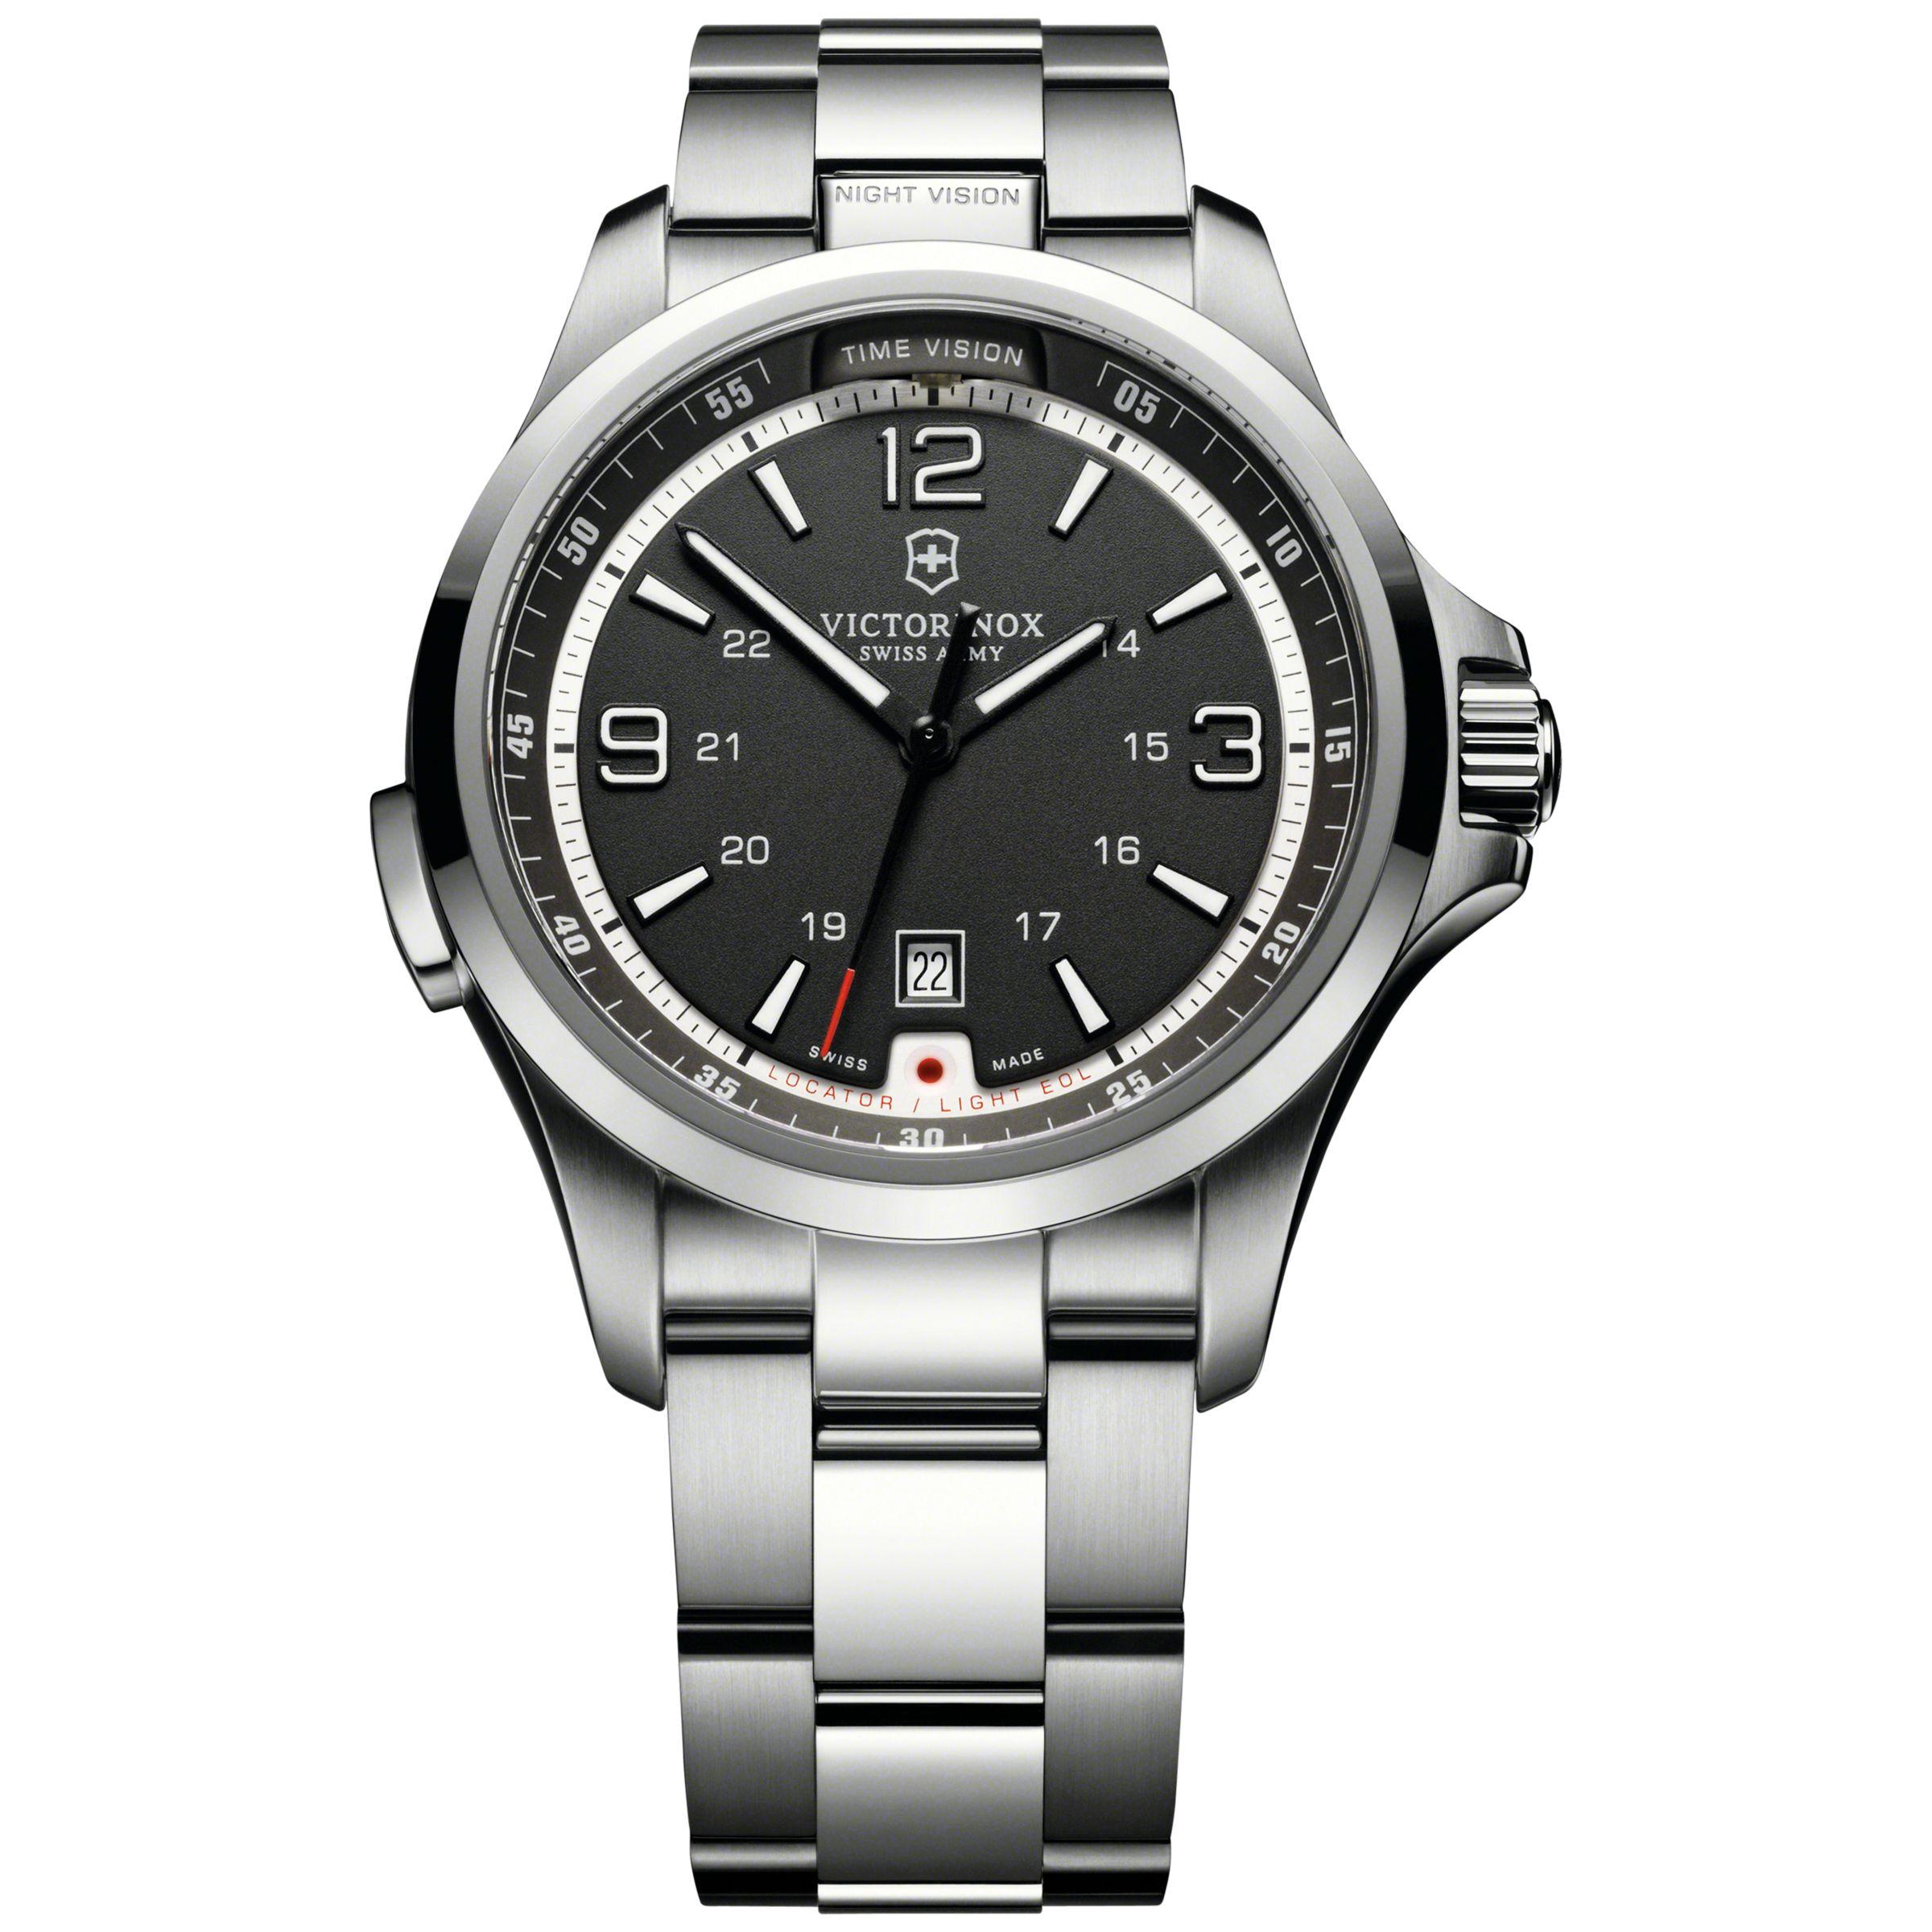 Victorinox Victorinox 241569 Men's Night Vision Bracelet Strap Watch, Silver/Black